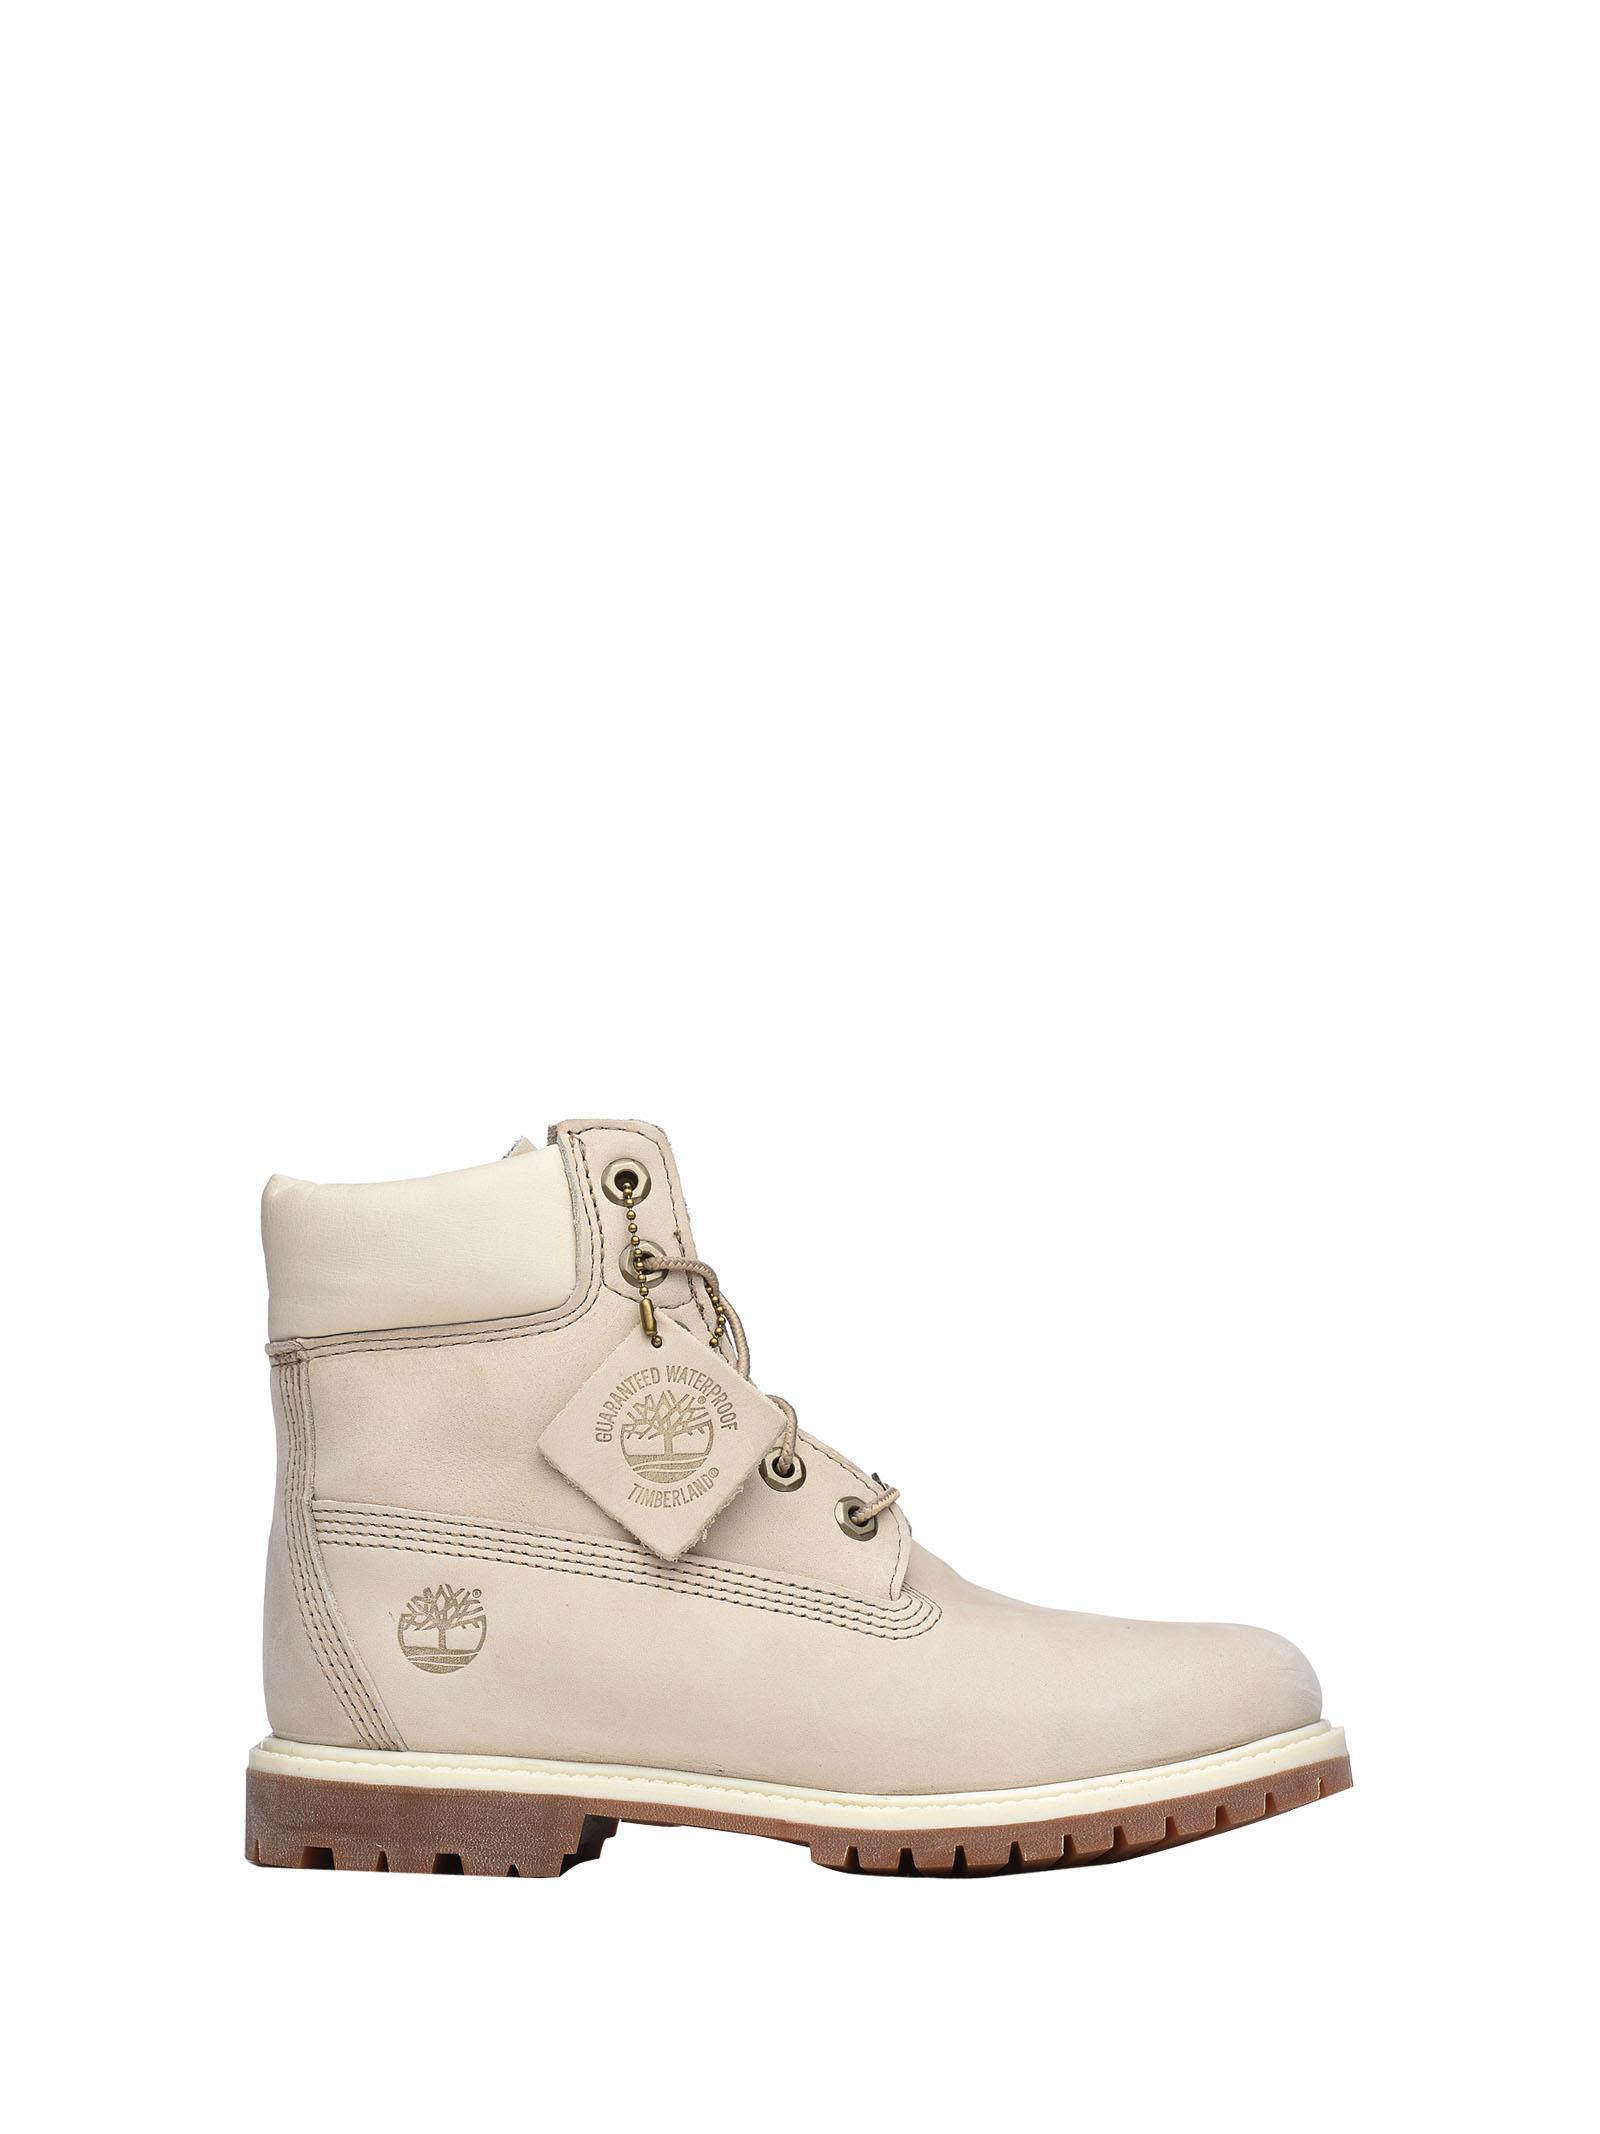 Timberland White Nabuk Ankle Boots